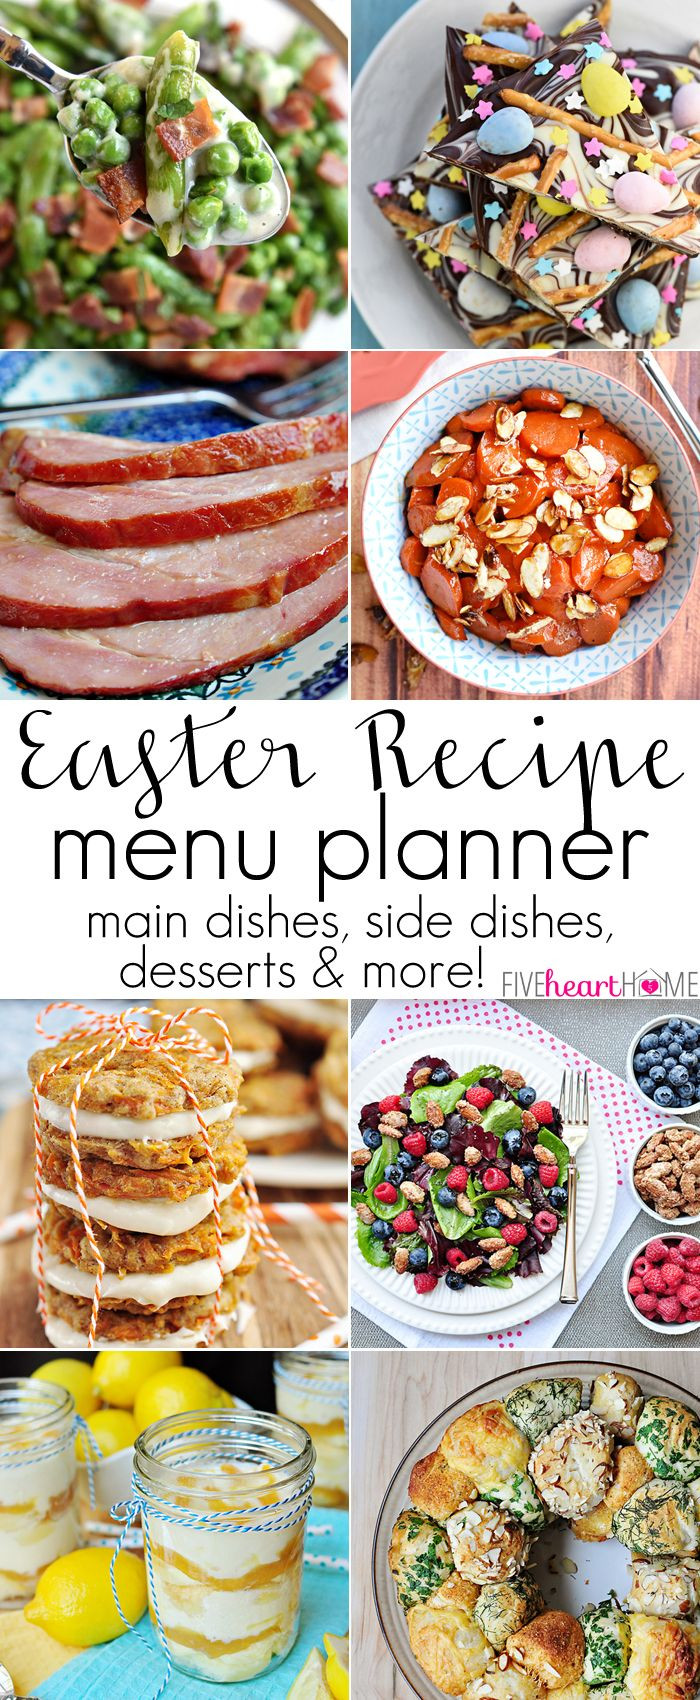 Easter Dinner Menus And Recipes  Best 25 Easter weekend ideas on Pinterest